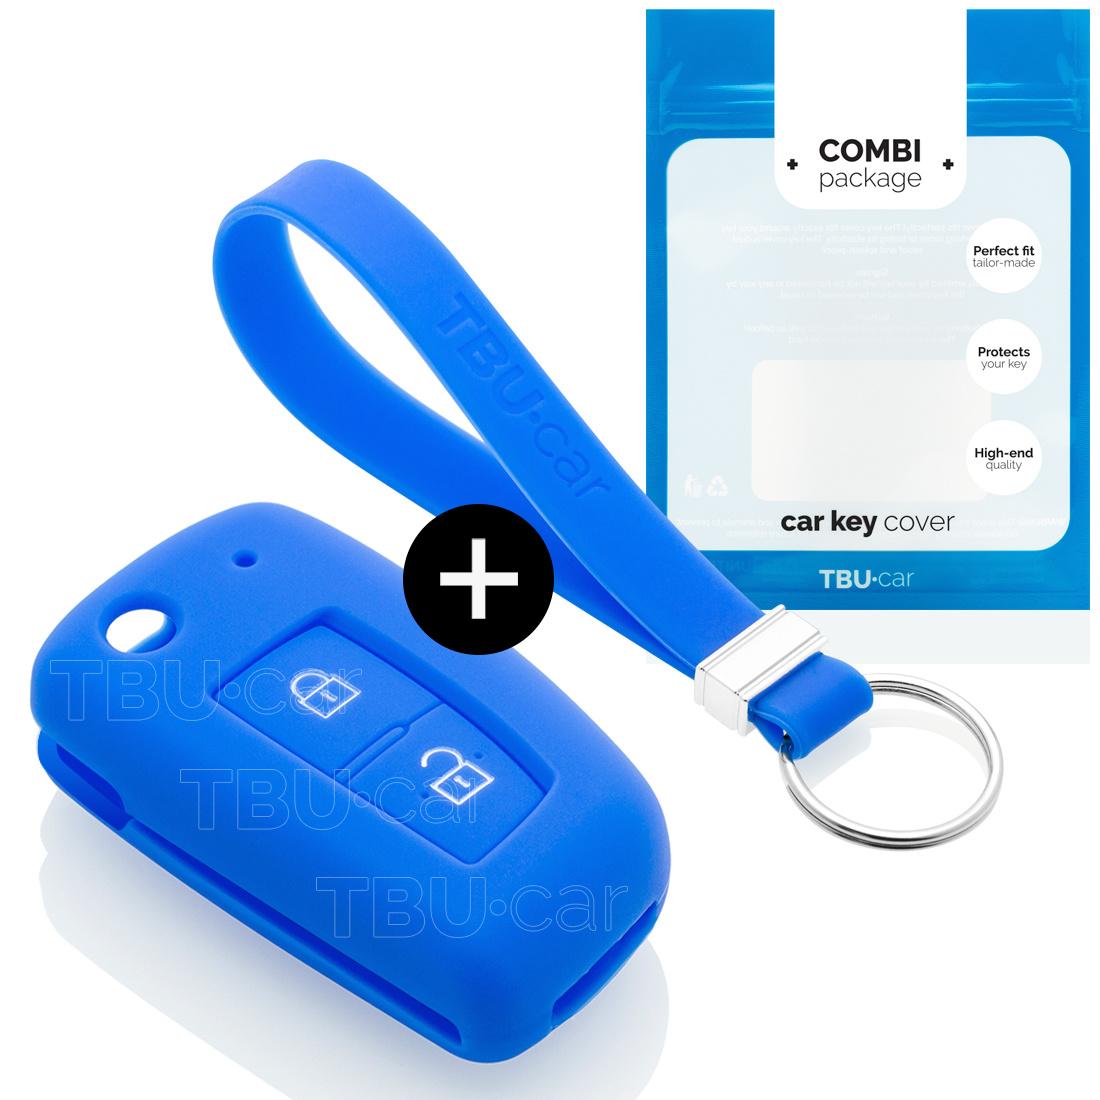 TBU car TBU car Autoschlüssel Hülle kompatibel mit Nissan 2 Tasten - Schutzhülle aus Silikon - Auto Schlüsselhülle Cover in Blau